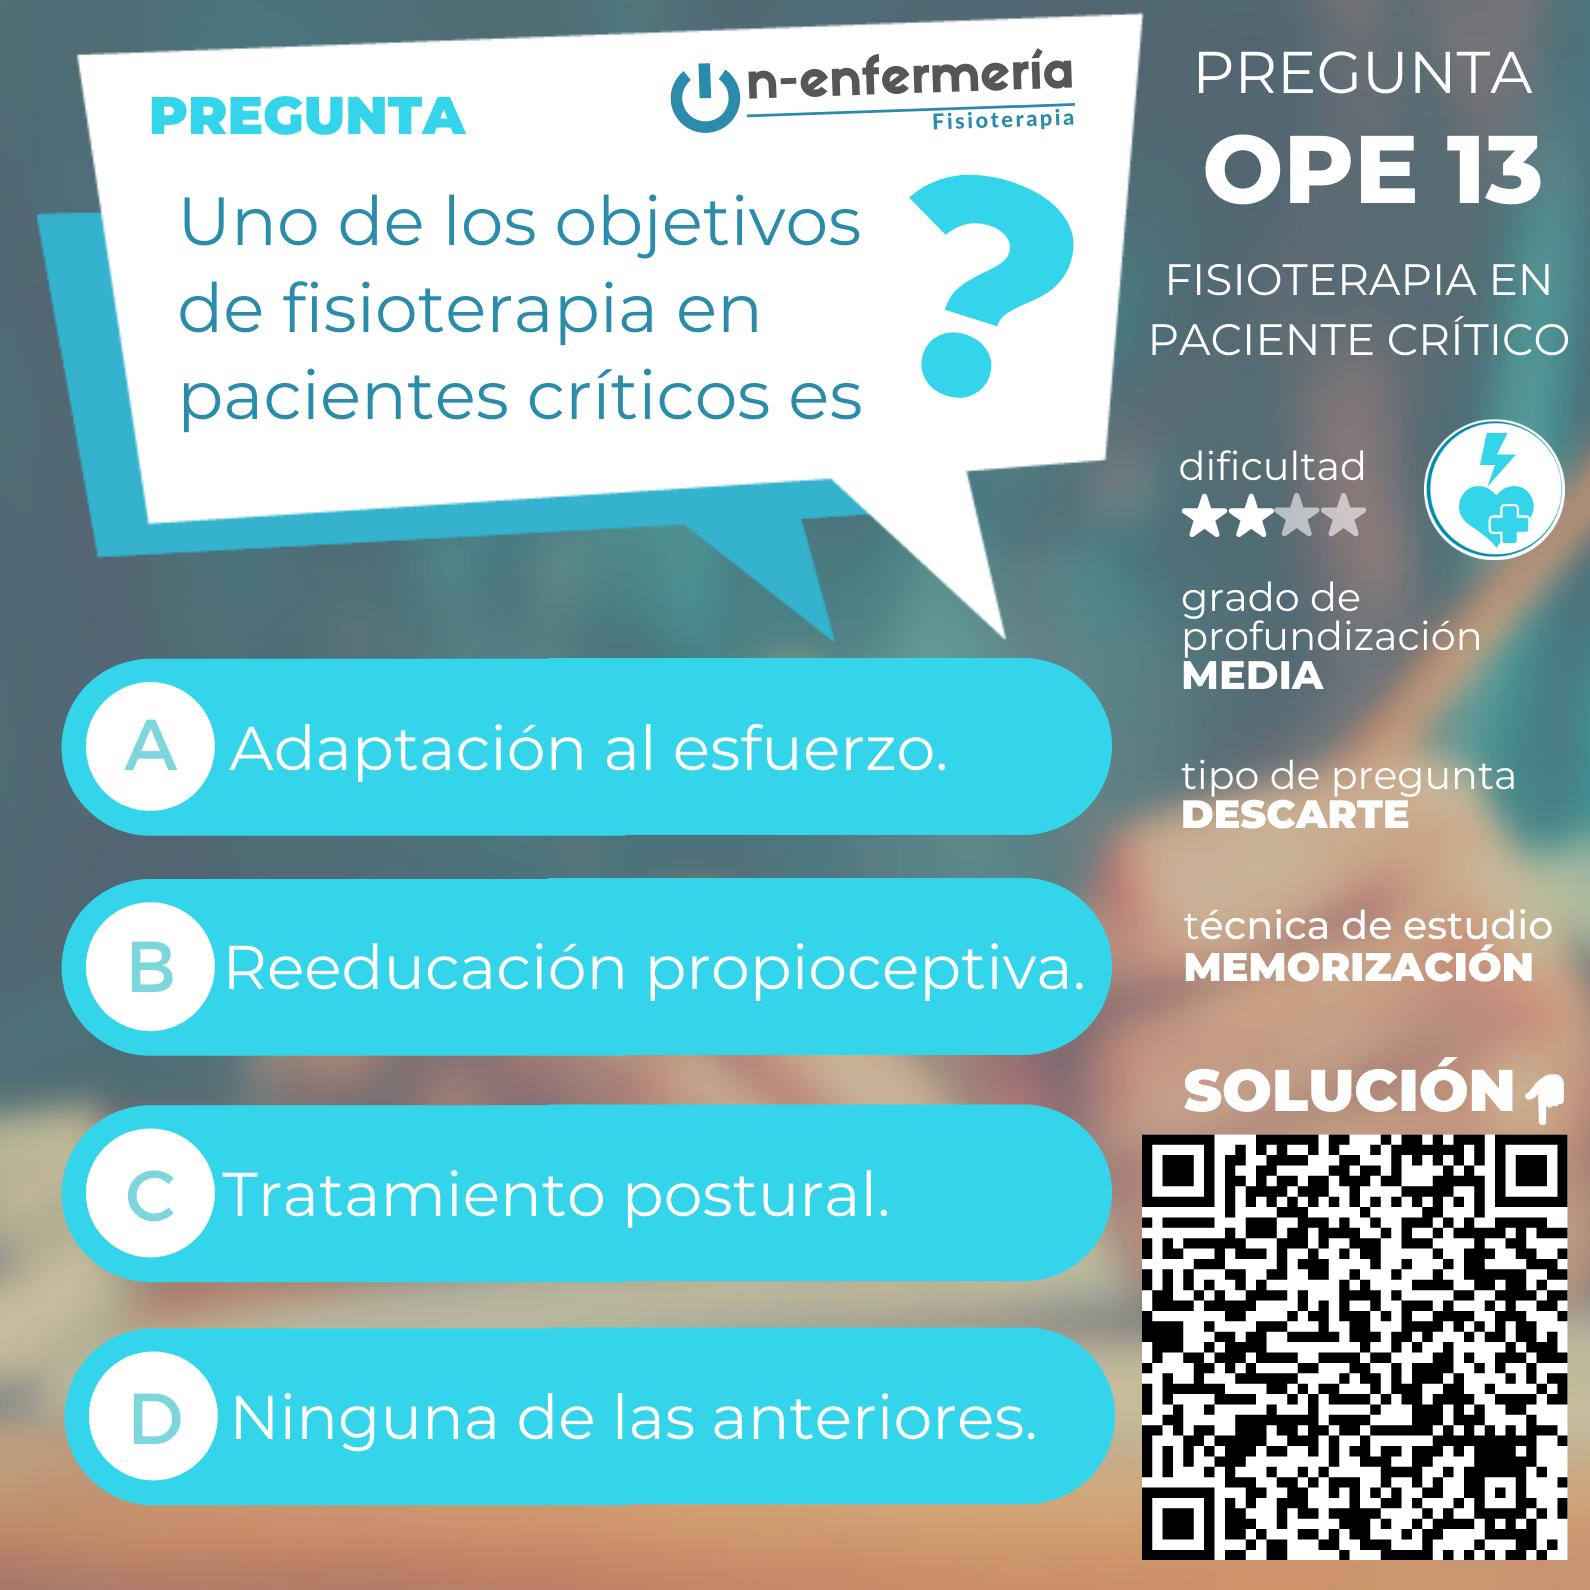 Pregunta nº 13 examen OPE Fisioterapia - Fisioterapia en paciente crítico